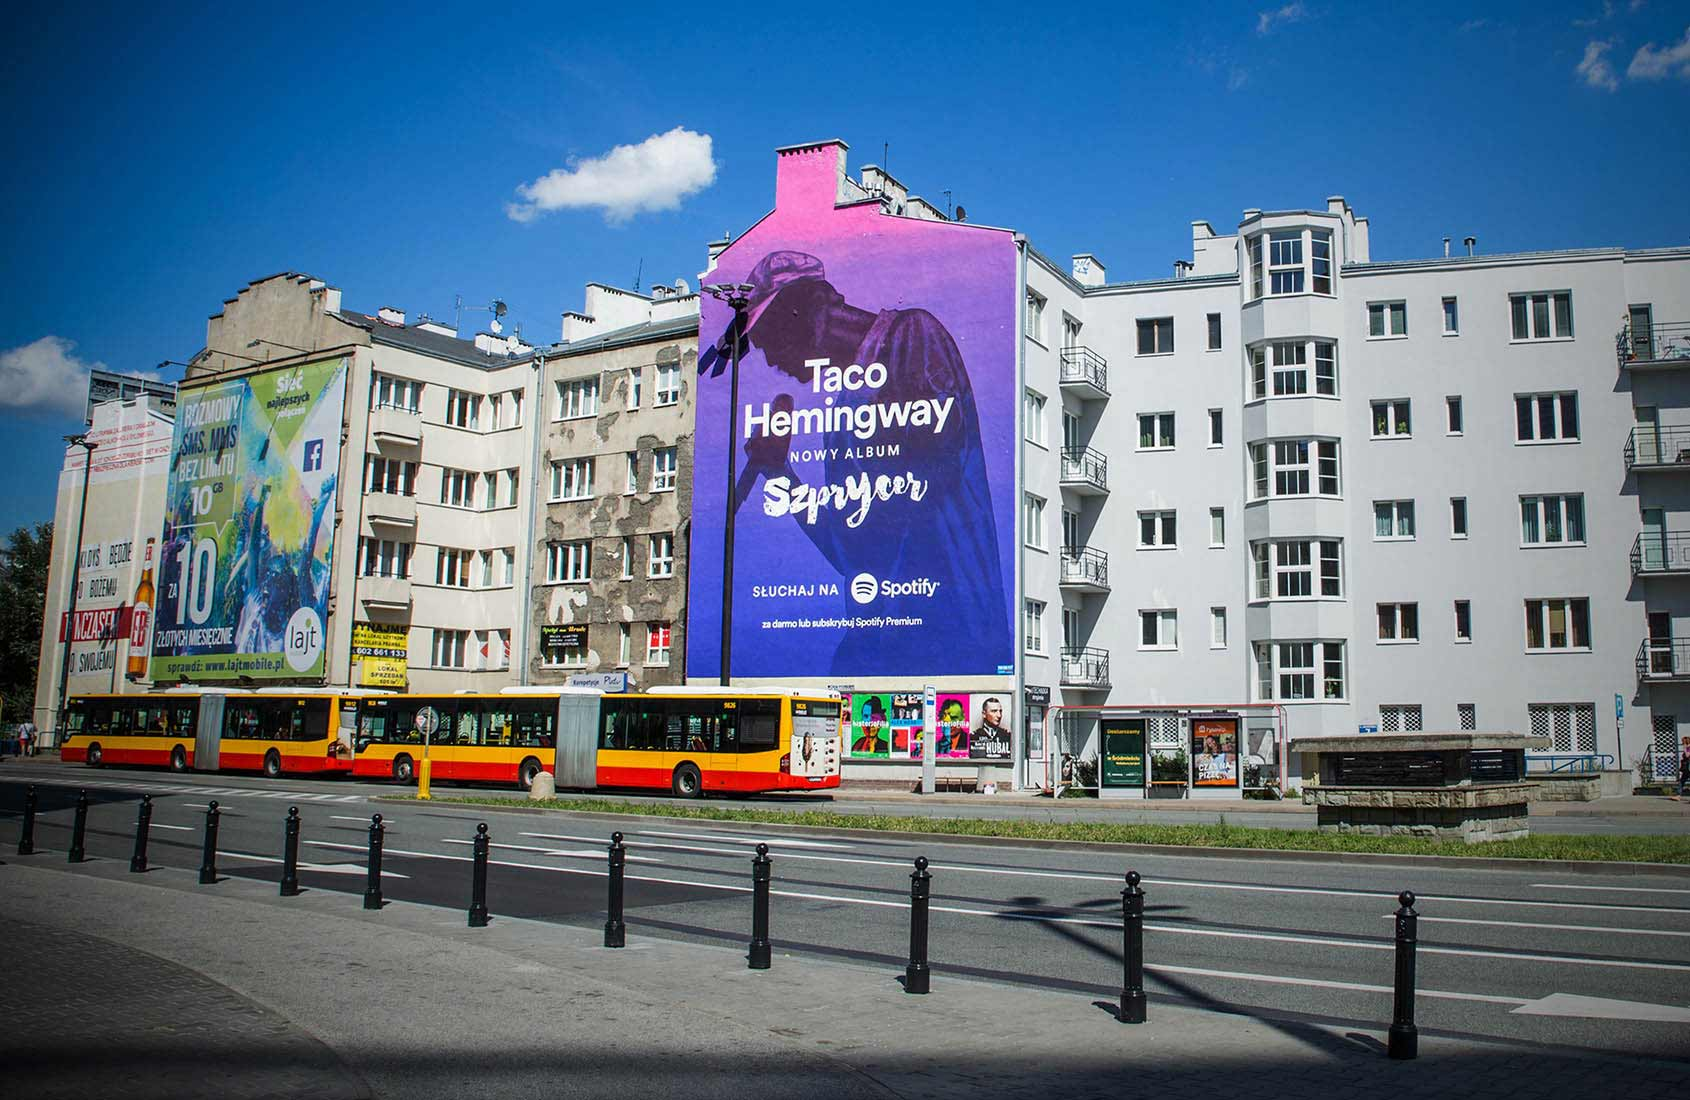 Spotify-Taco-Hemingway-Metro-Politechnika-Mural